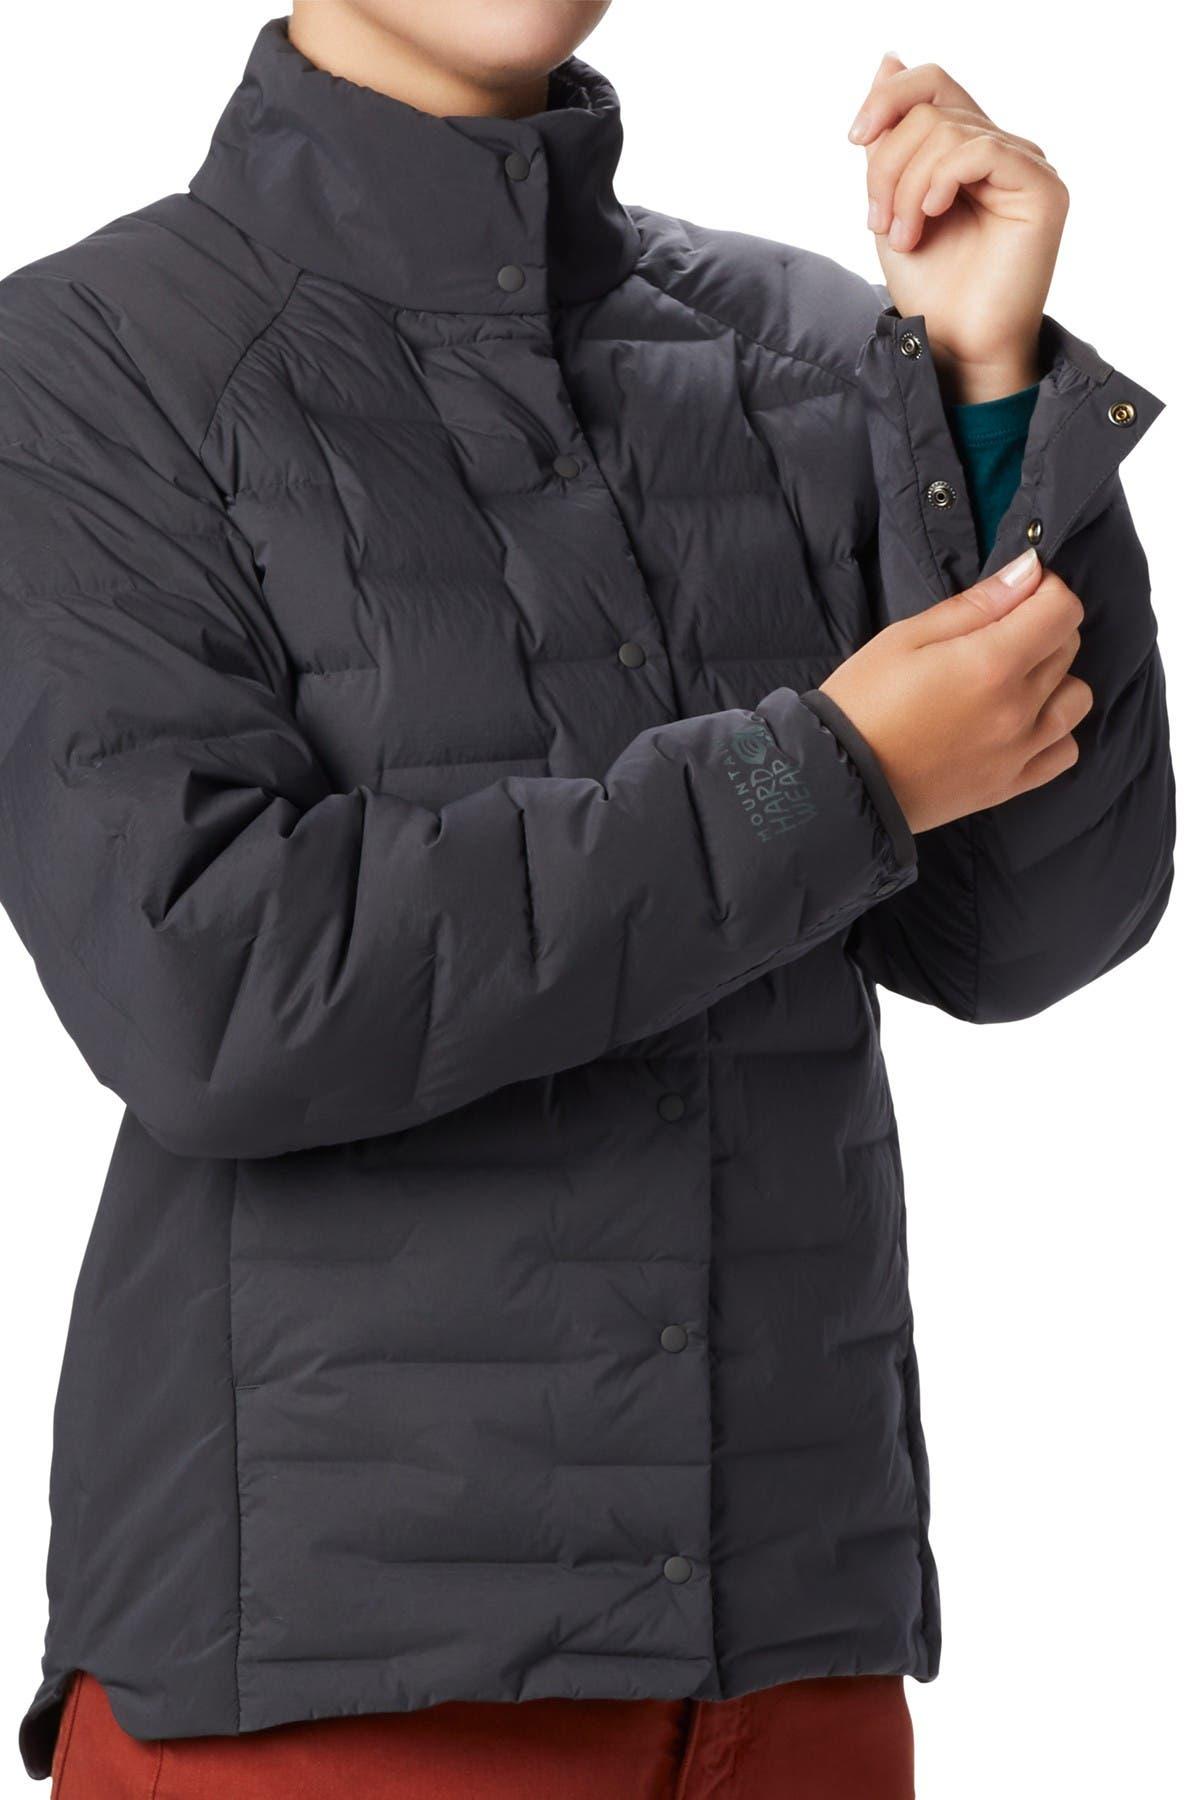 MOUNTAIN HARDWEAR Super D/S™ Shirt Jacket